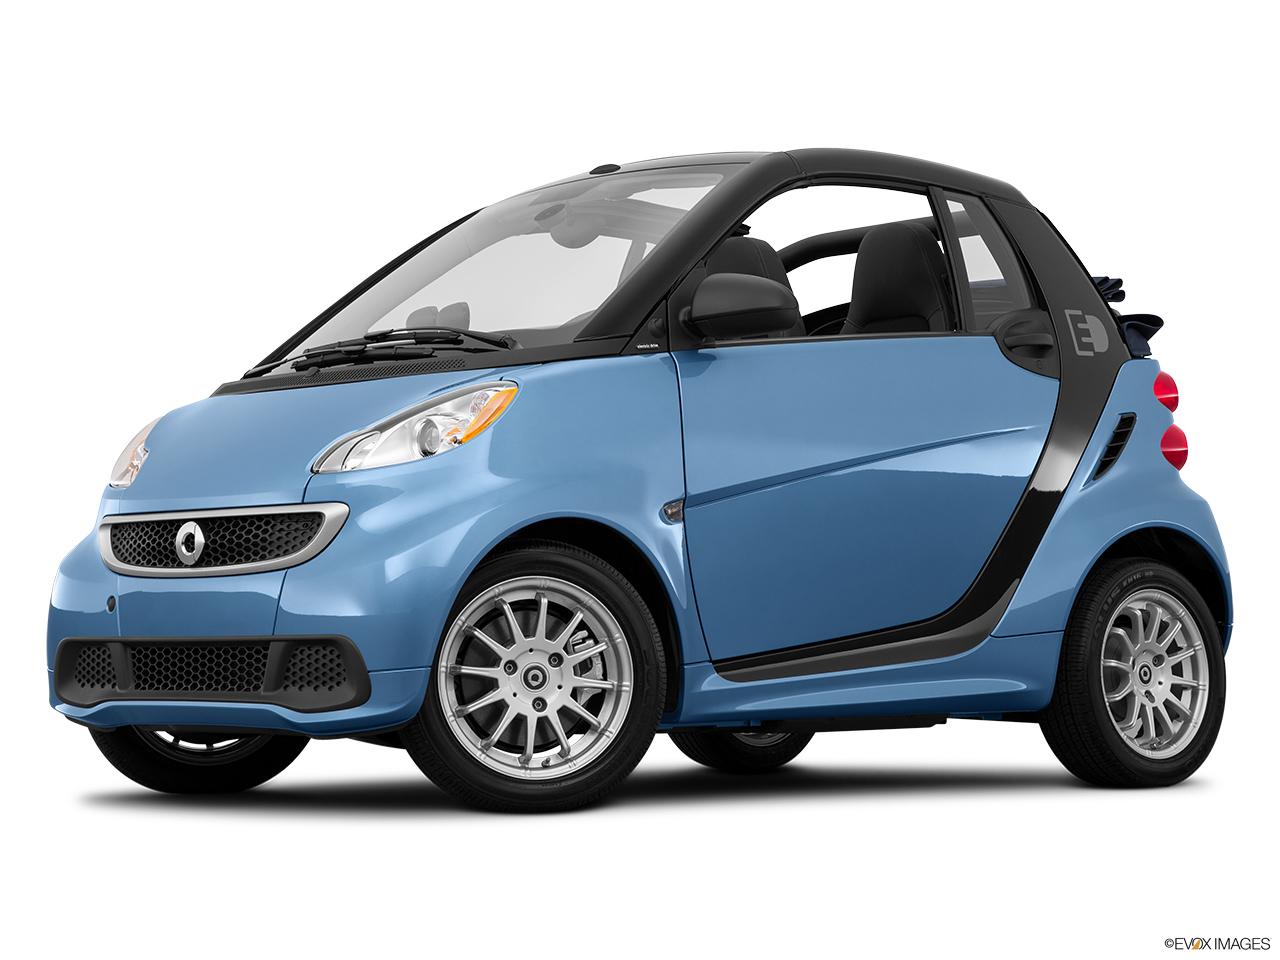 2015 smart fortwo electric drive 2 door cabriolet passion. Black Bedroom Furniture Sets. Home Design Ideas